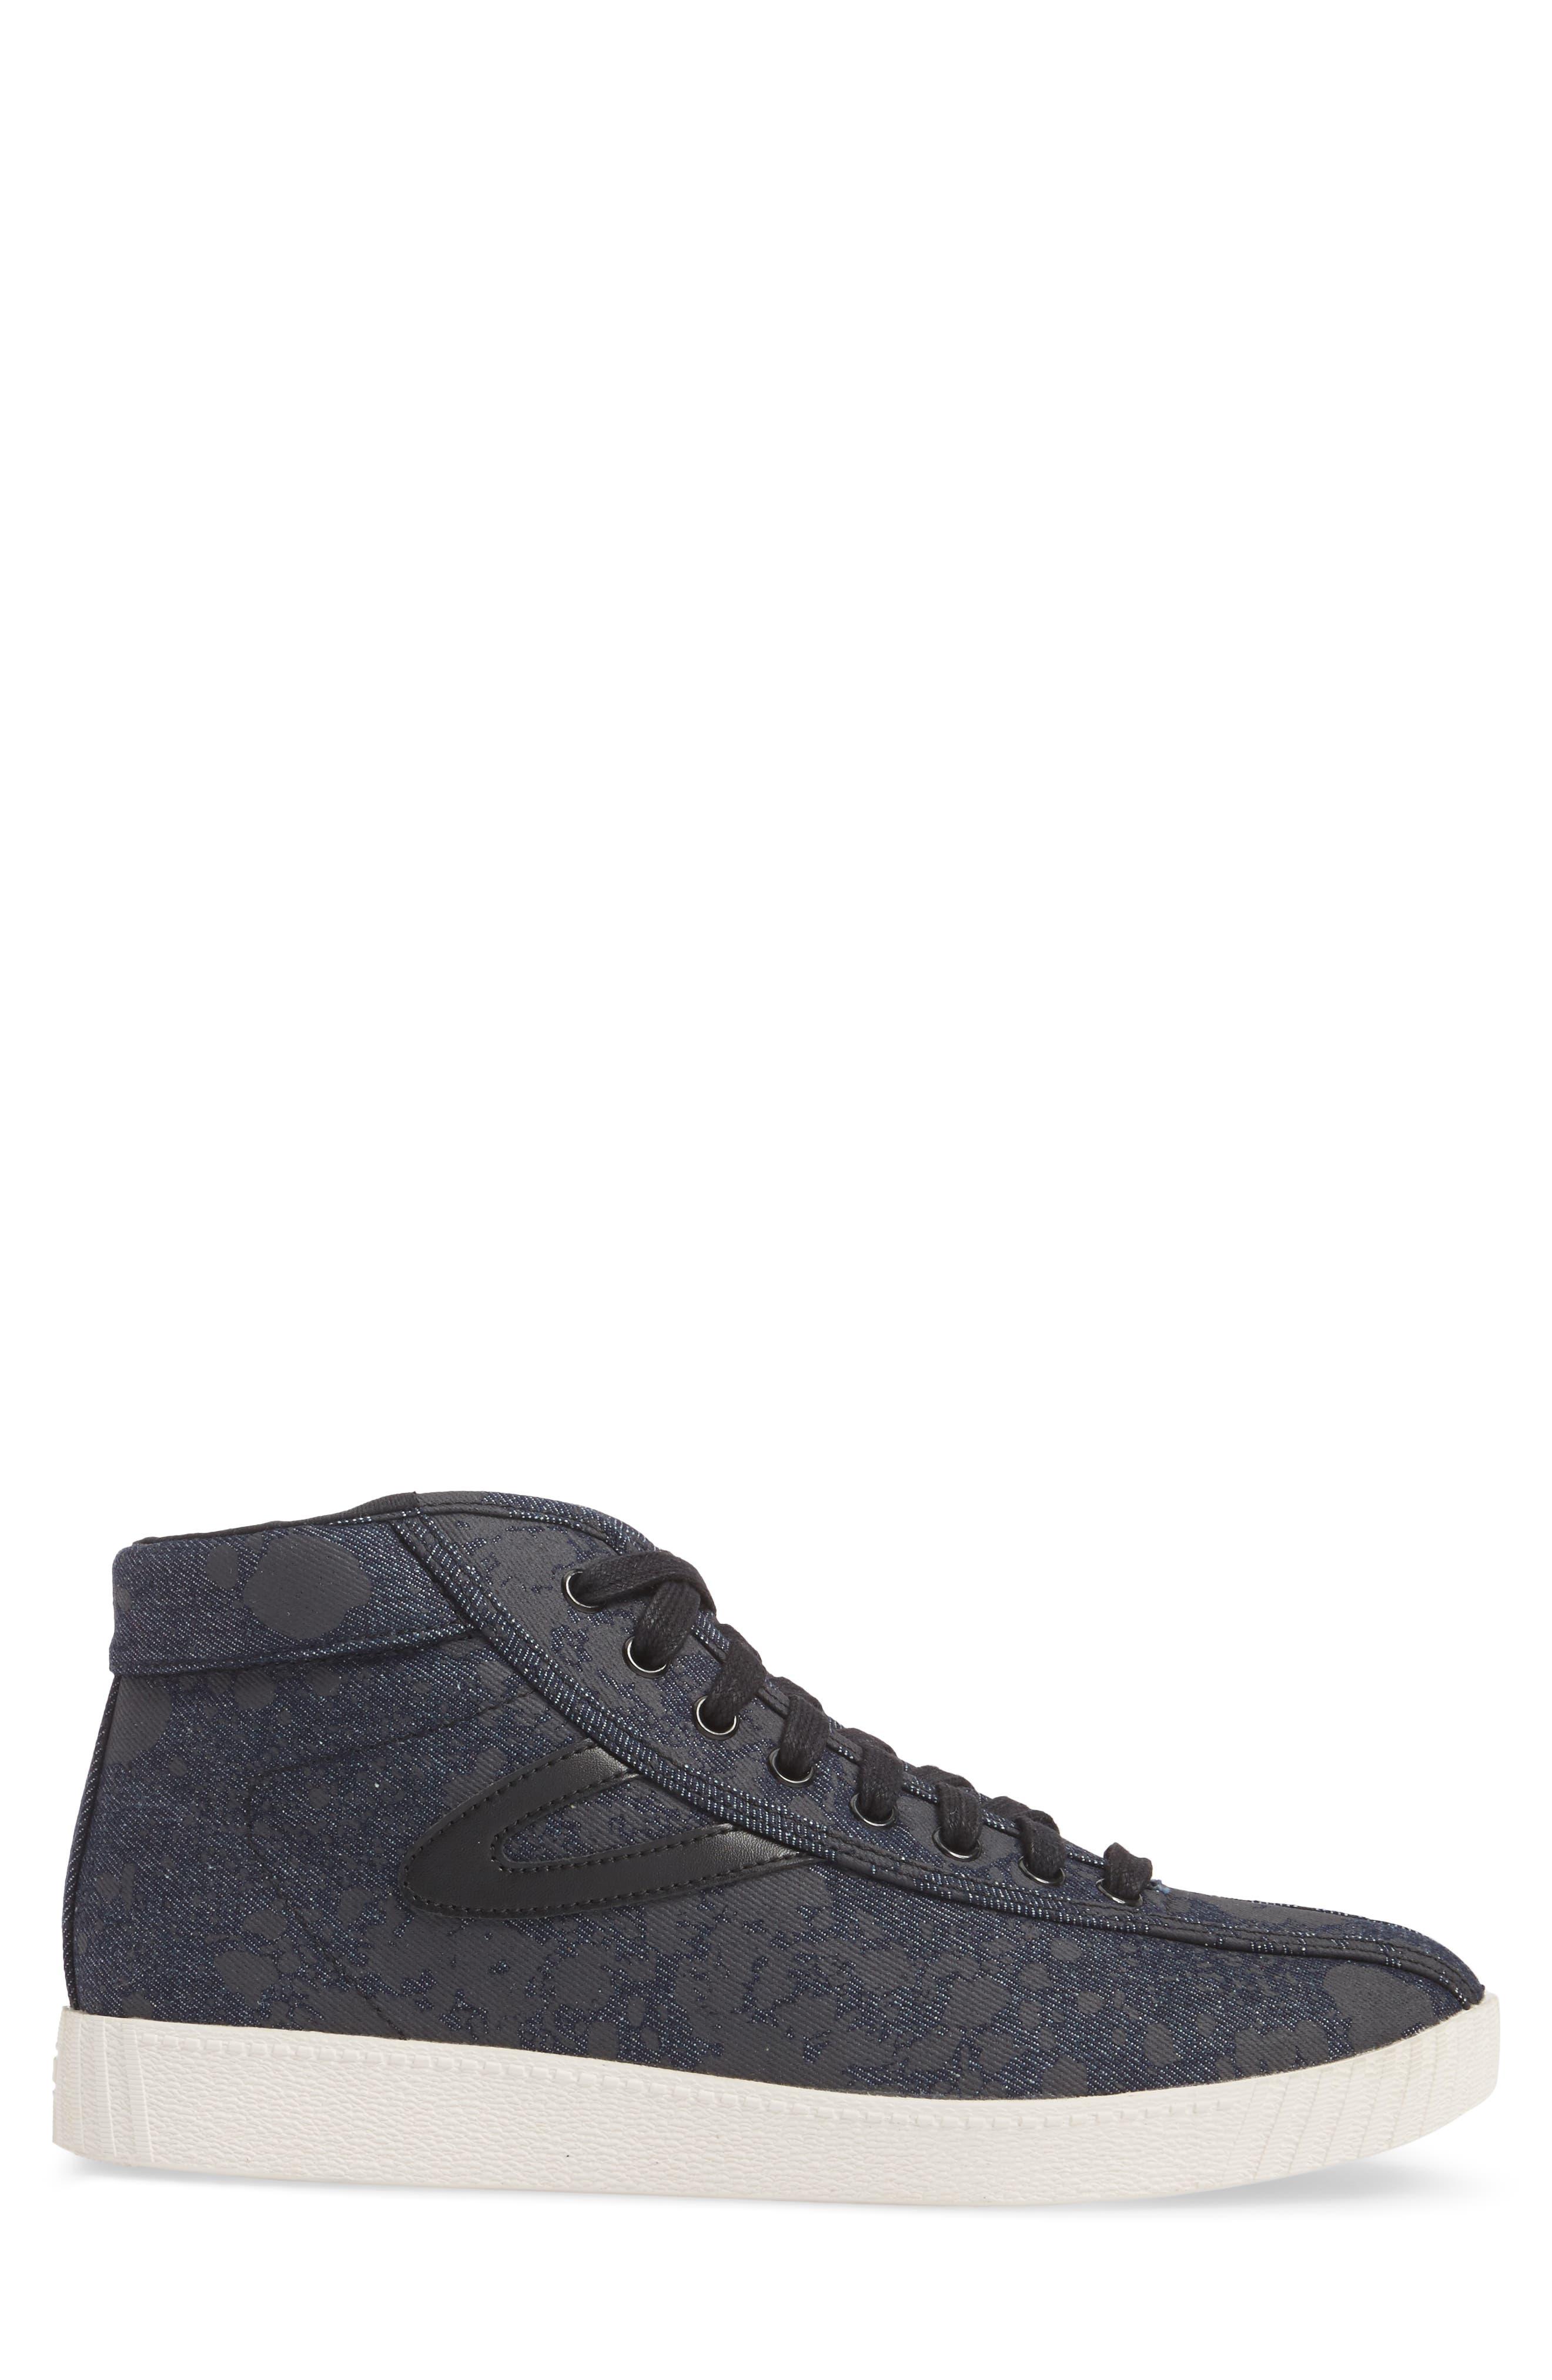 Nylite High Top Sneaker,                             Alternate thumbnail 3, color,                             Nero Opaco/ Black Denim